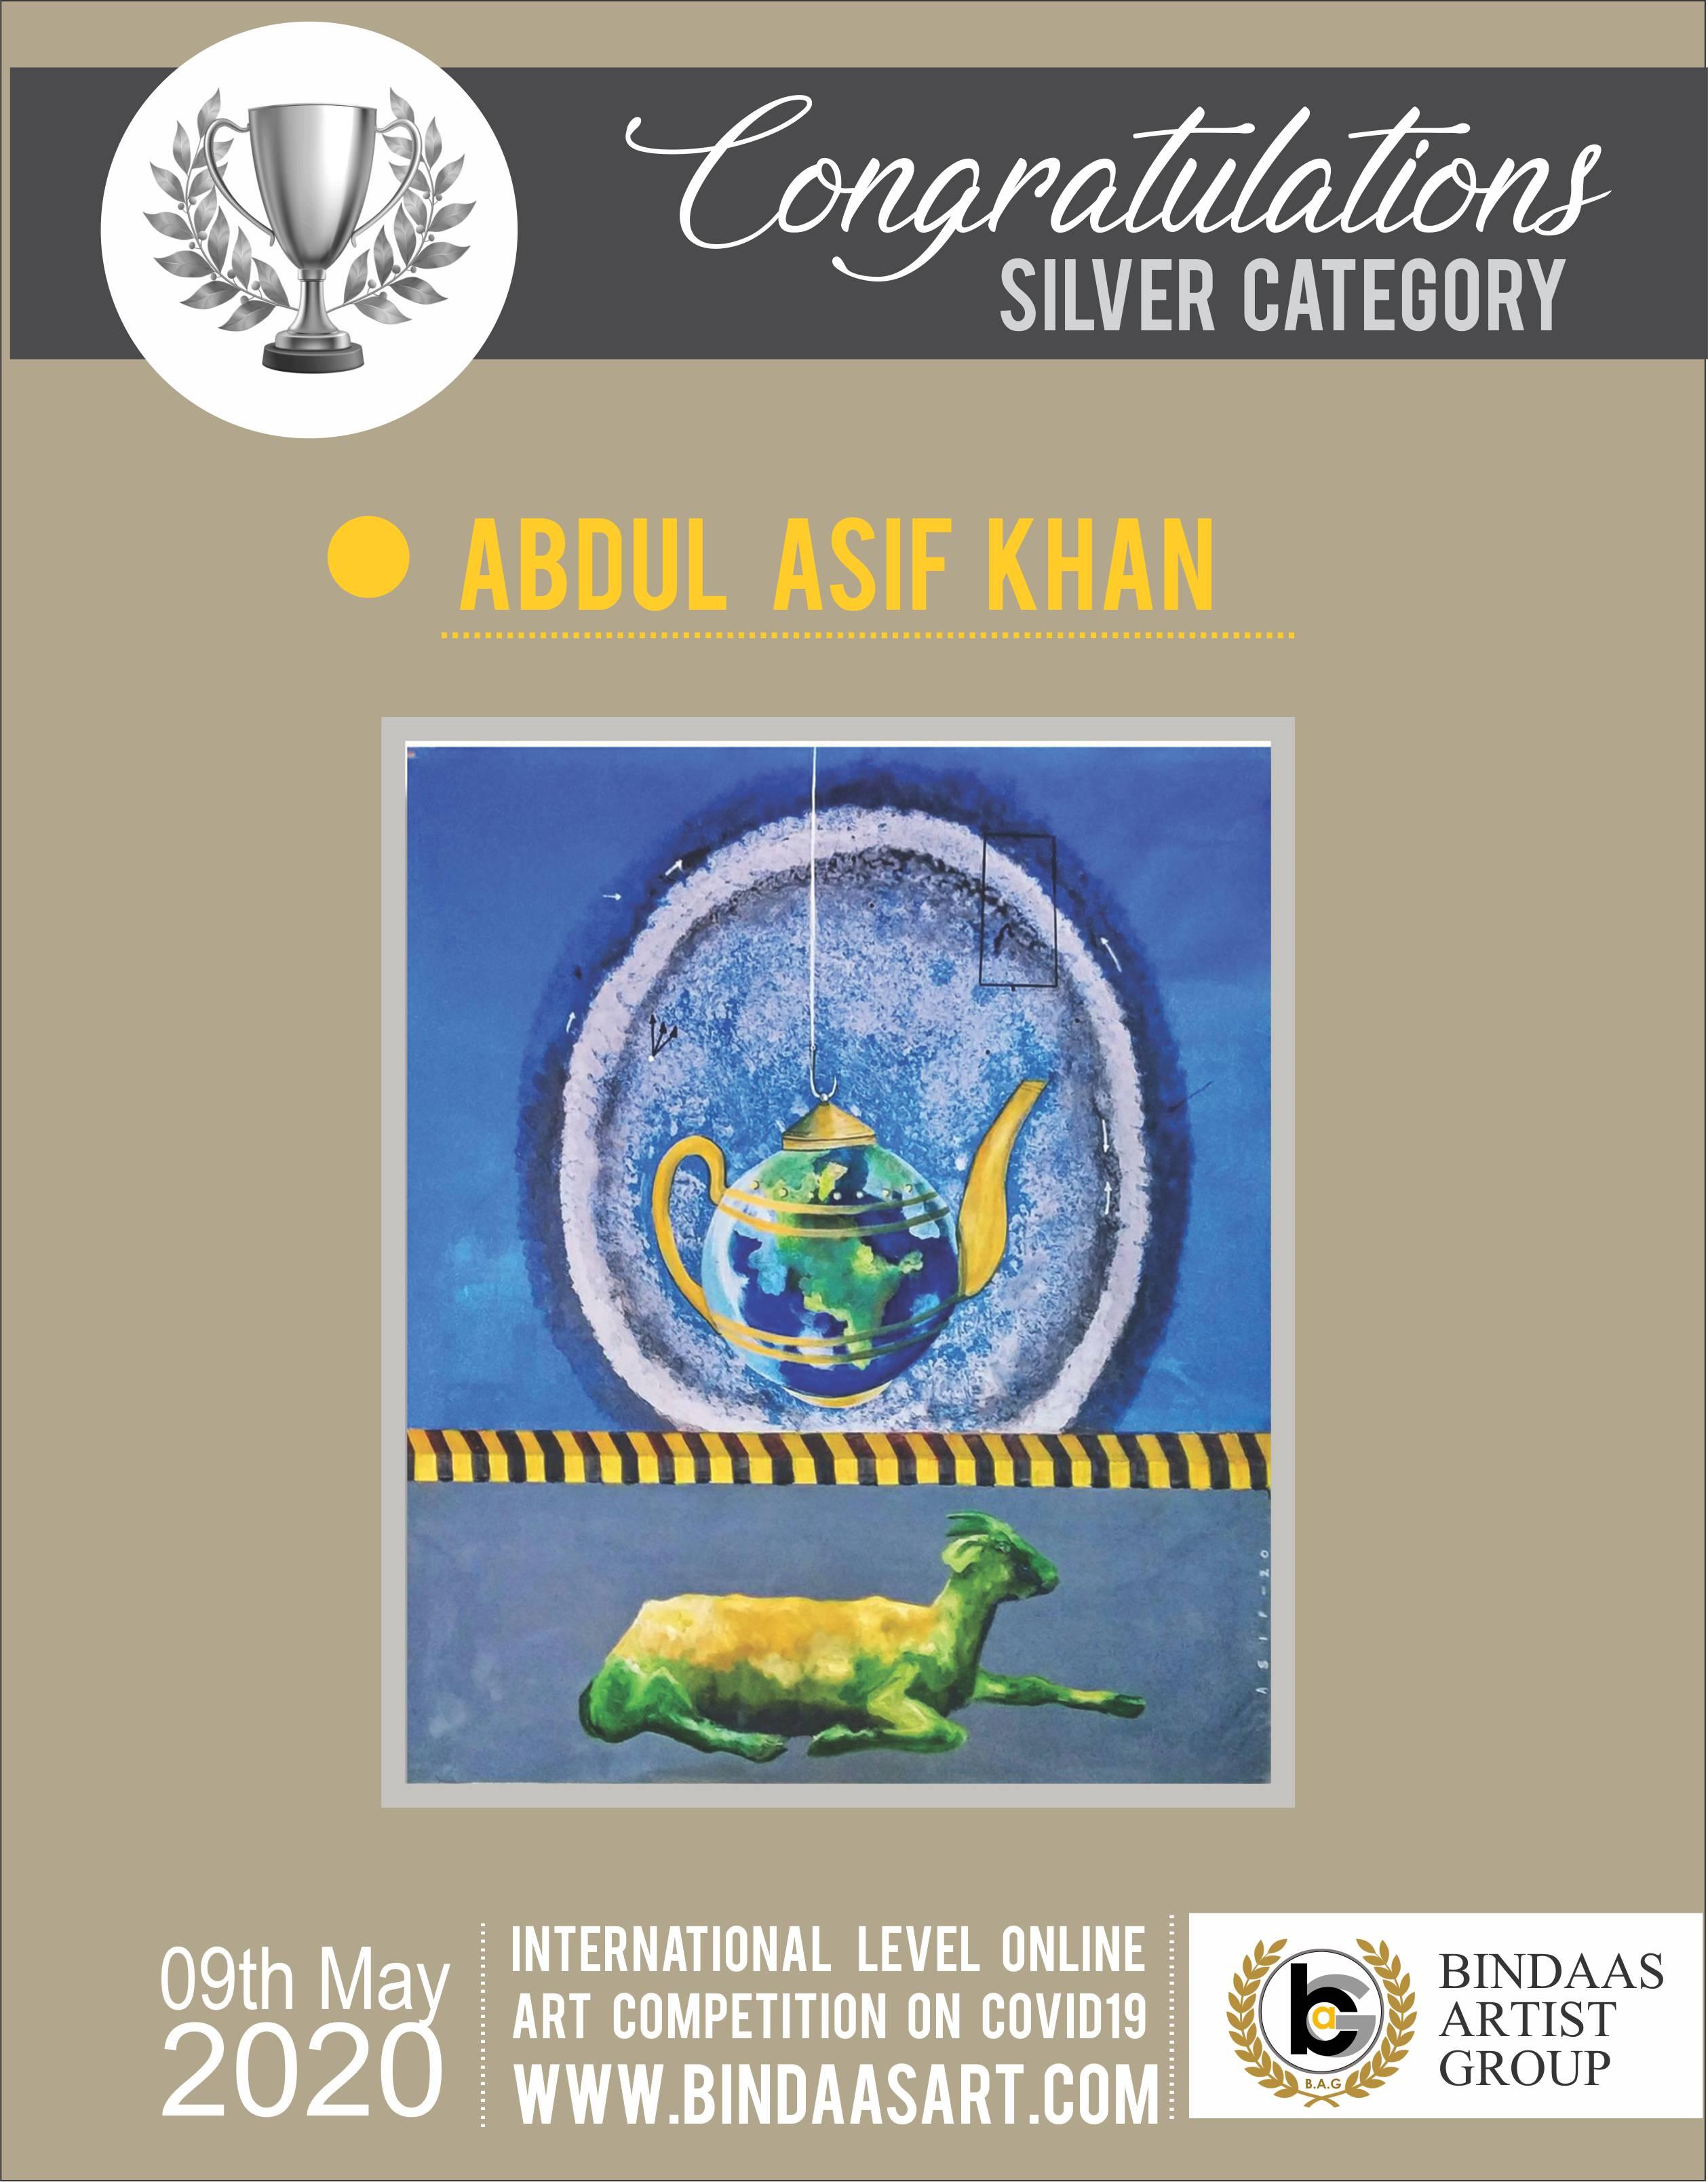 Abdul Asif Khan